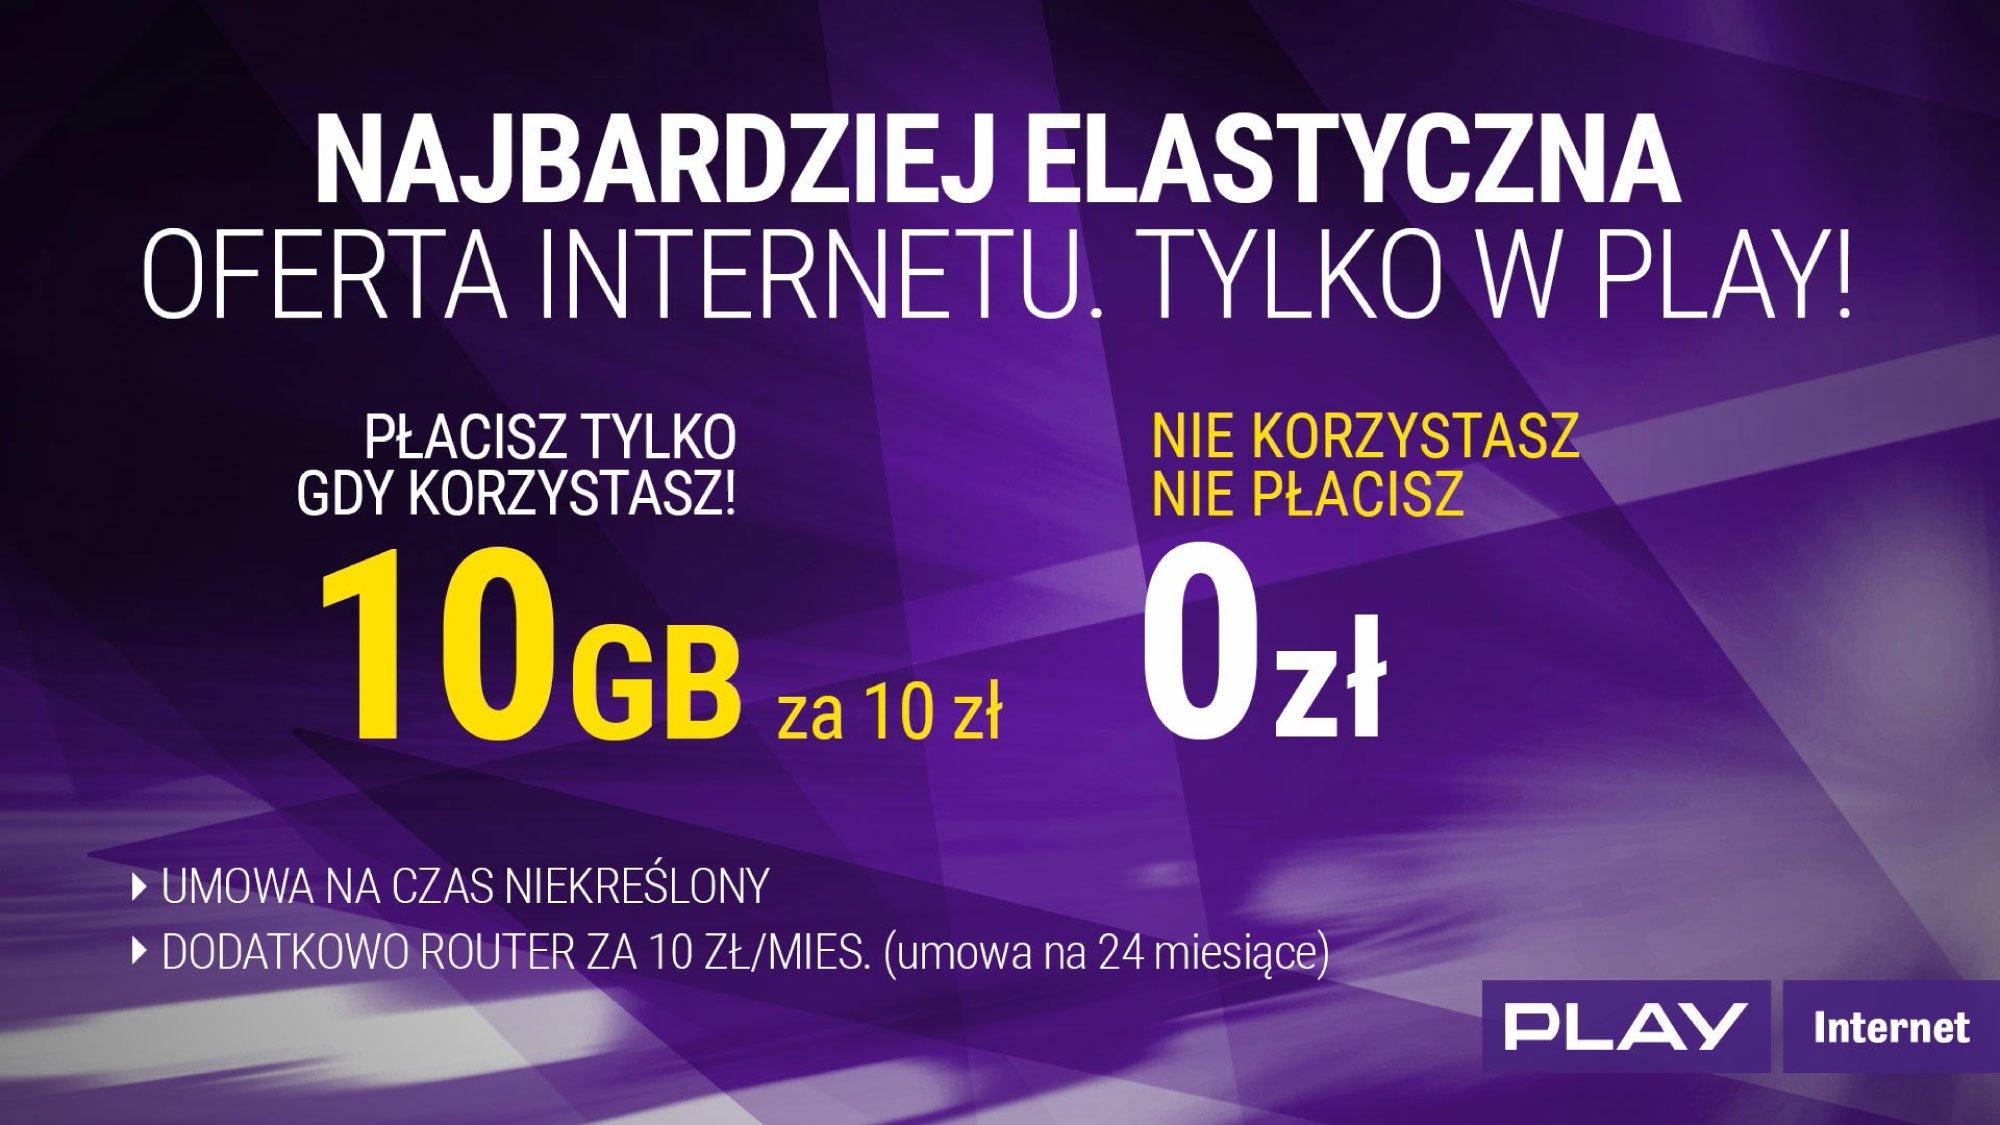 Play 10 GB za 10 zł 2